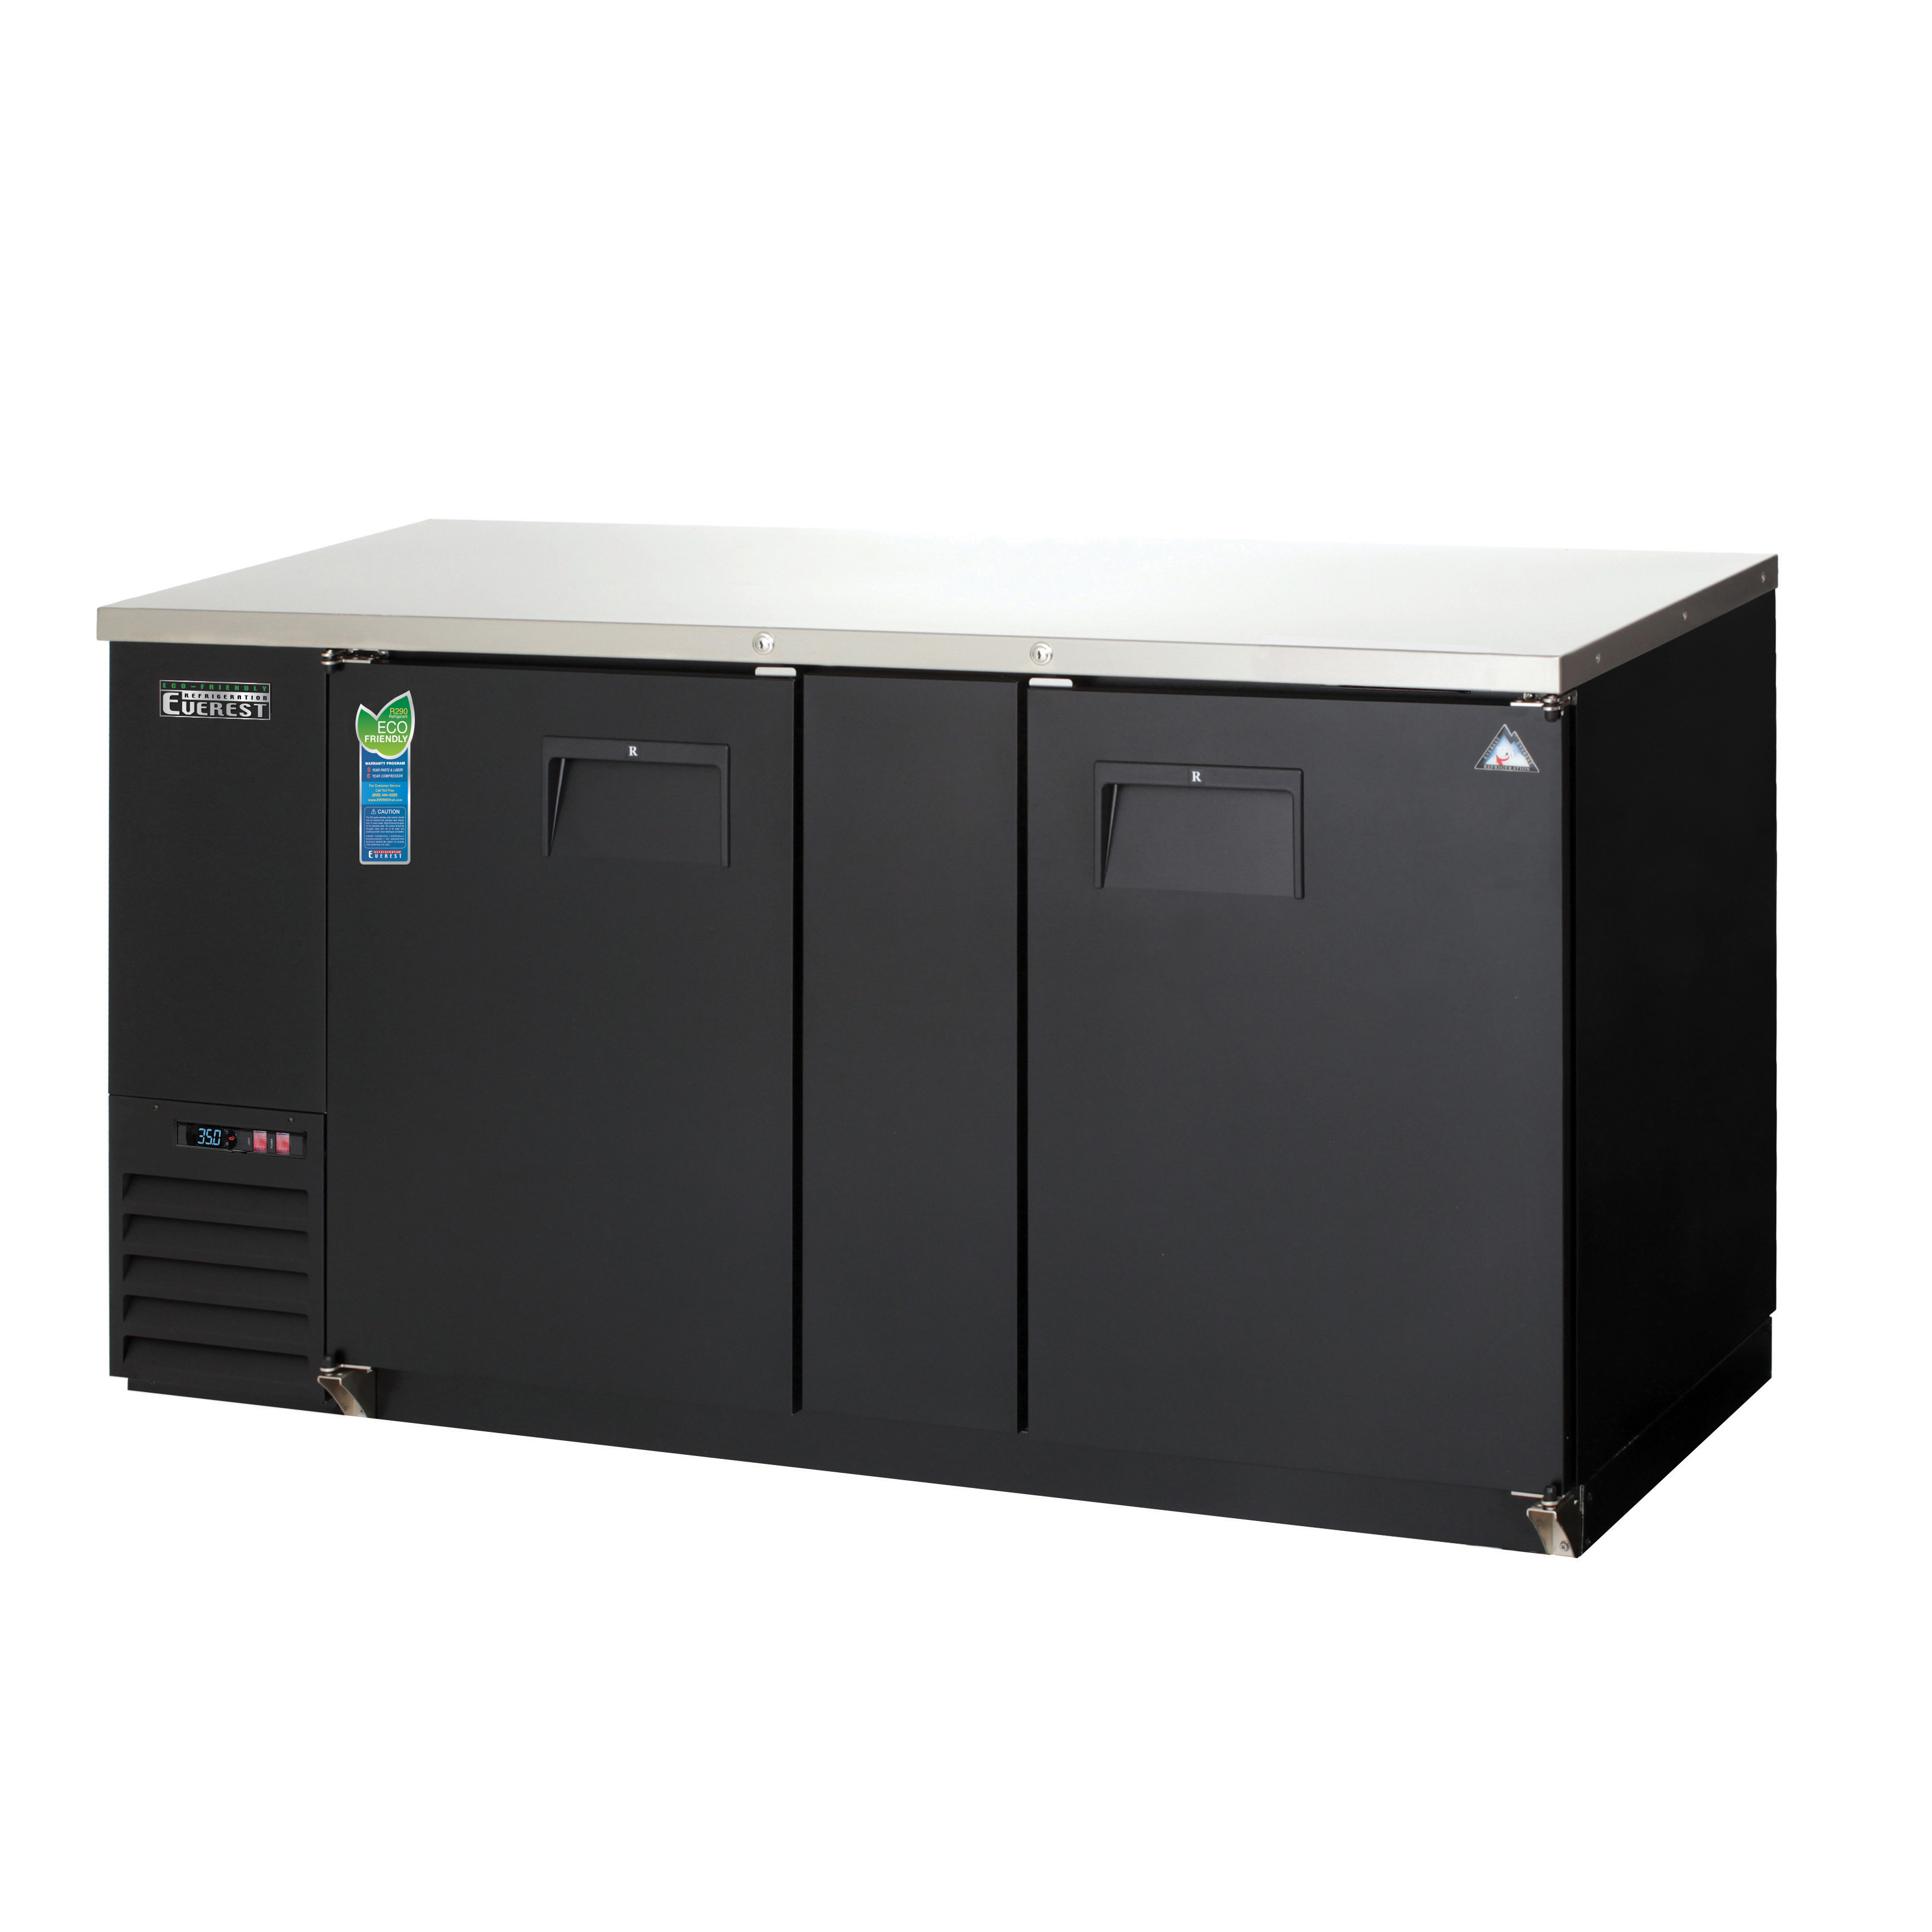 Everest Refrigeration EBB69 back bar cabinet, refrigerated